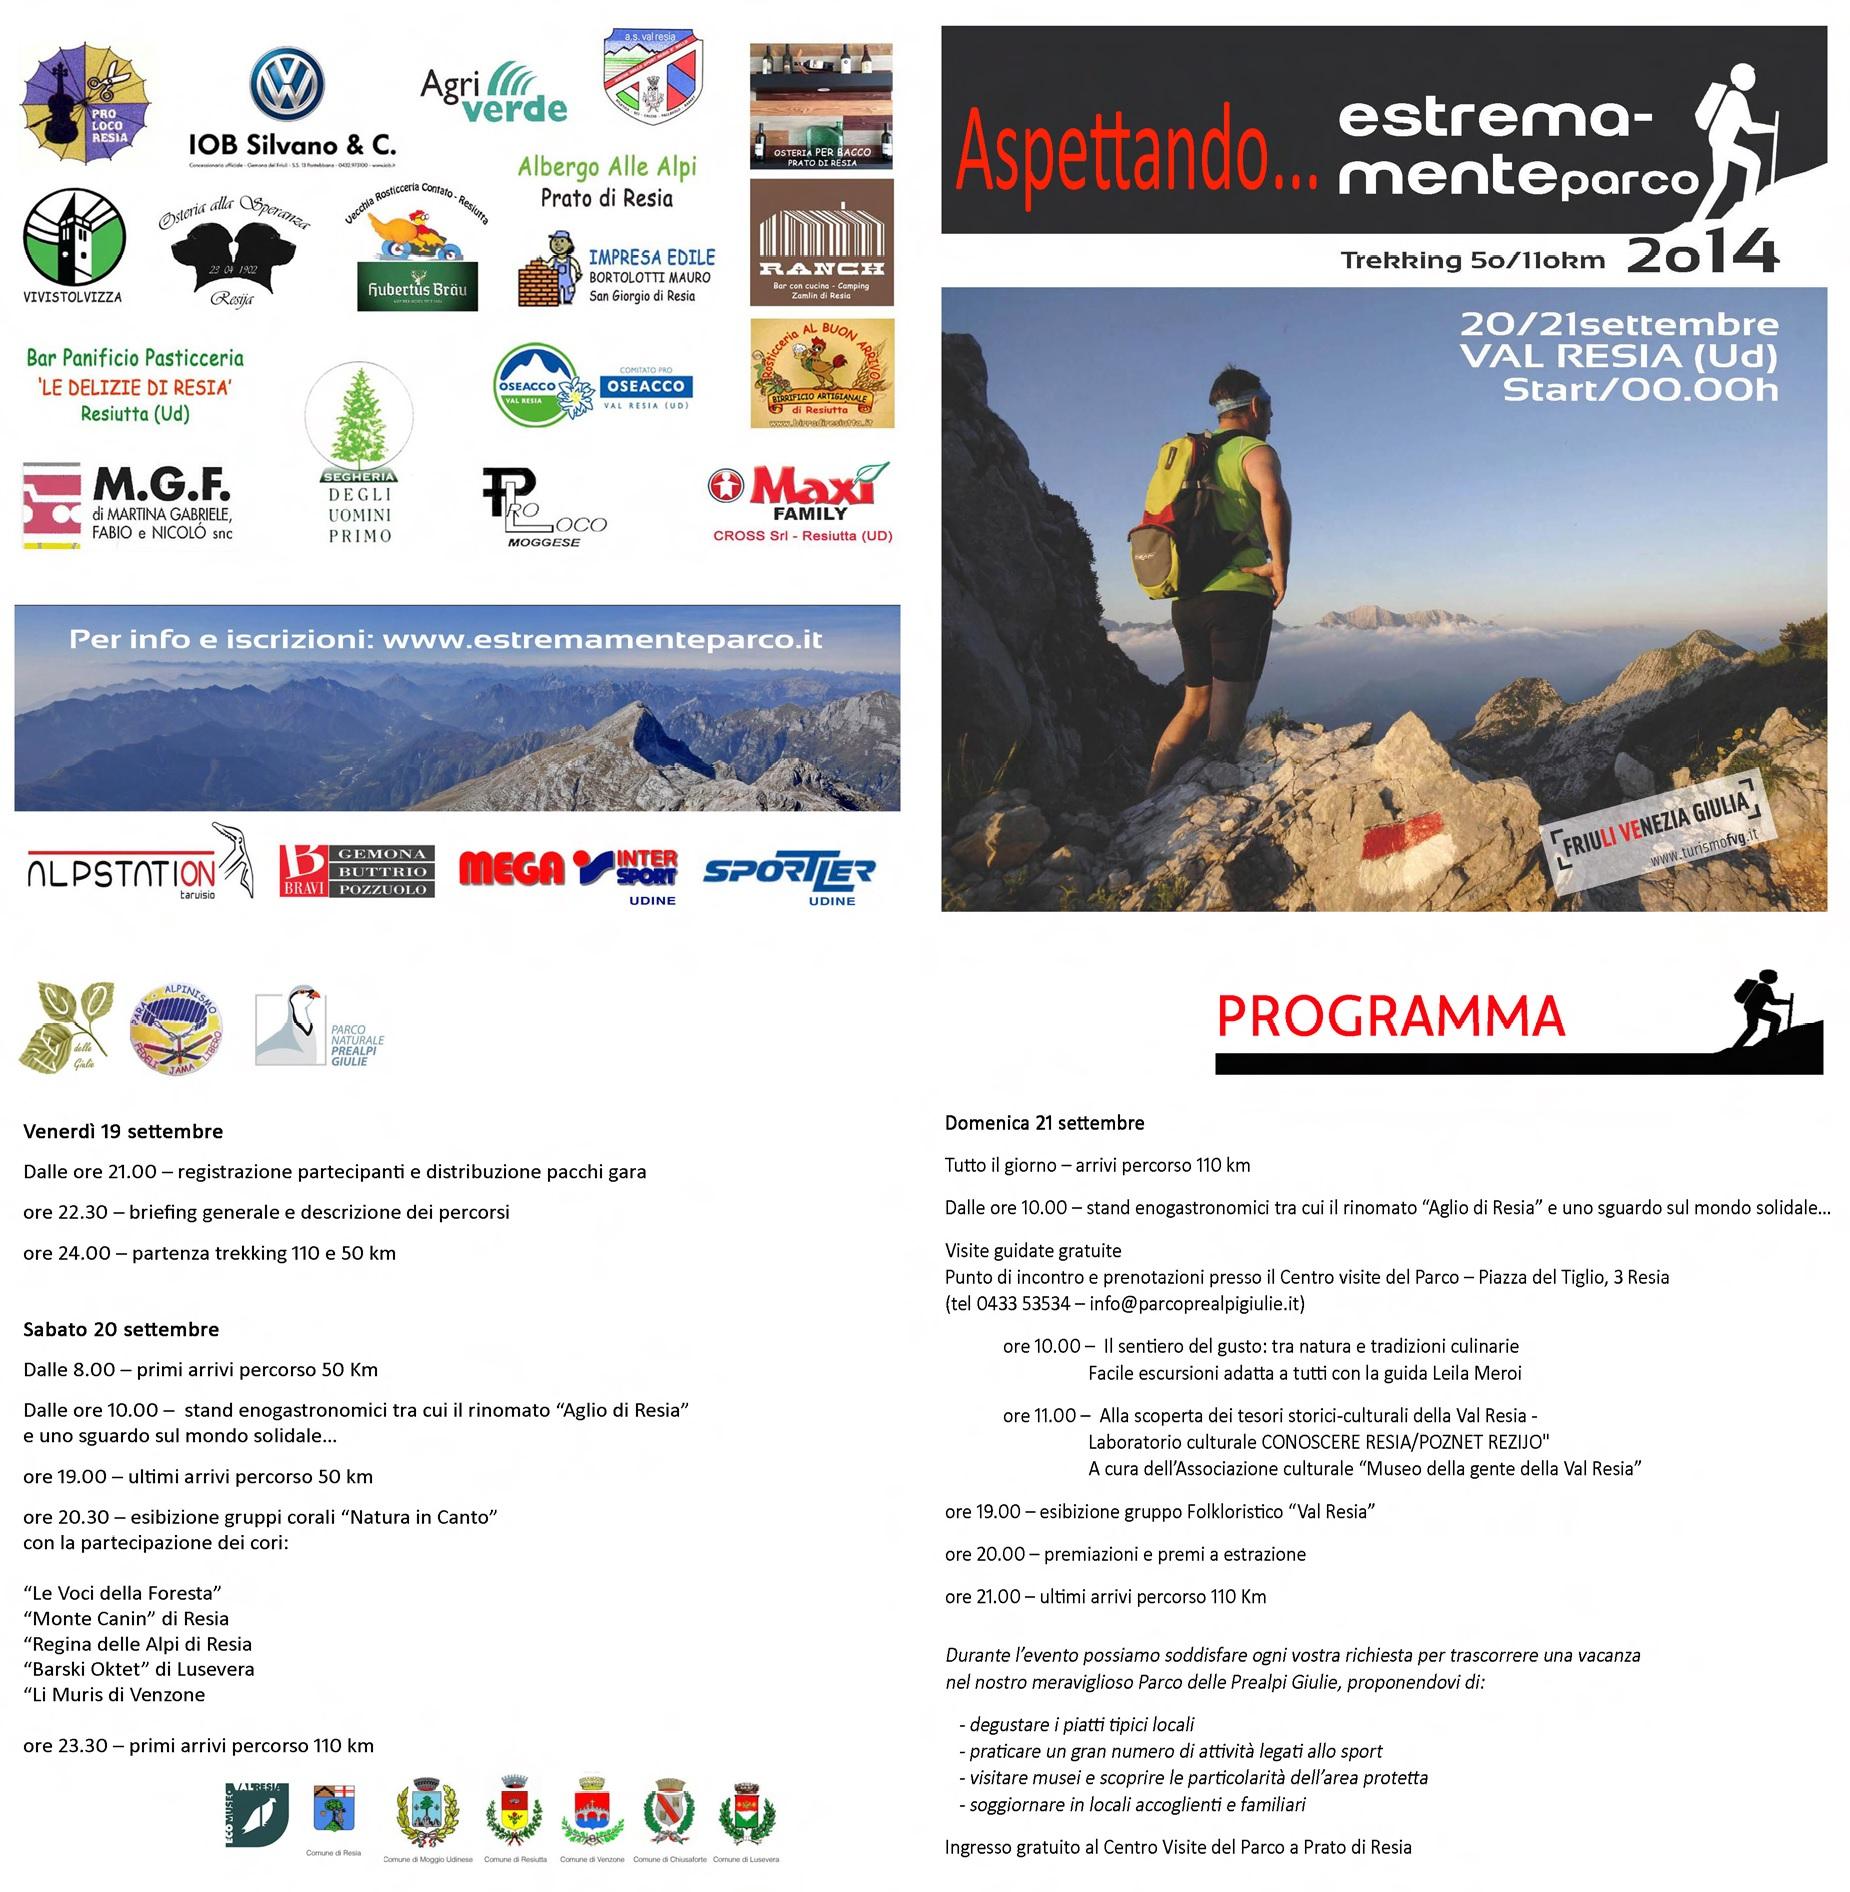 Programma_estrema_evento_2014